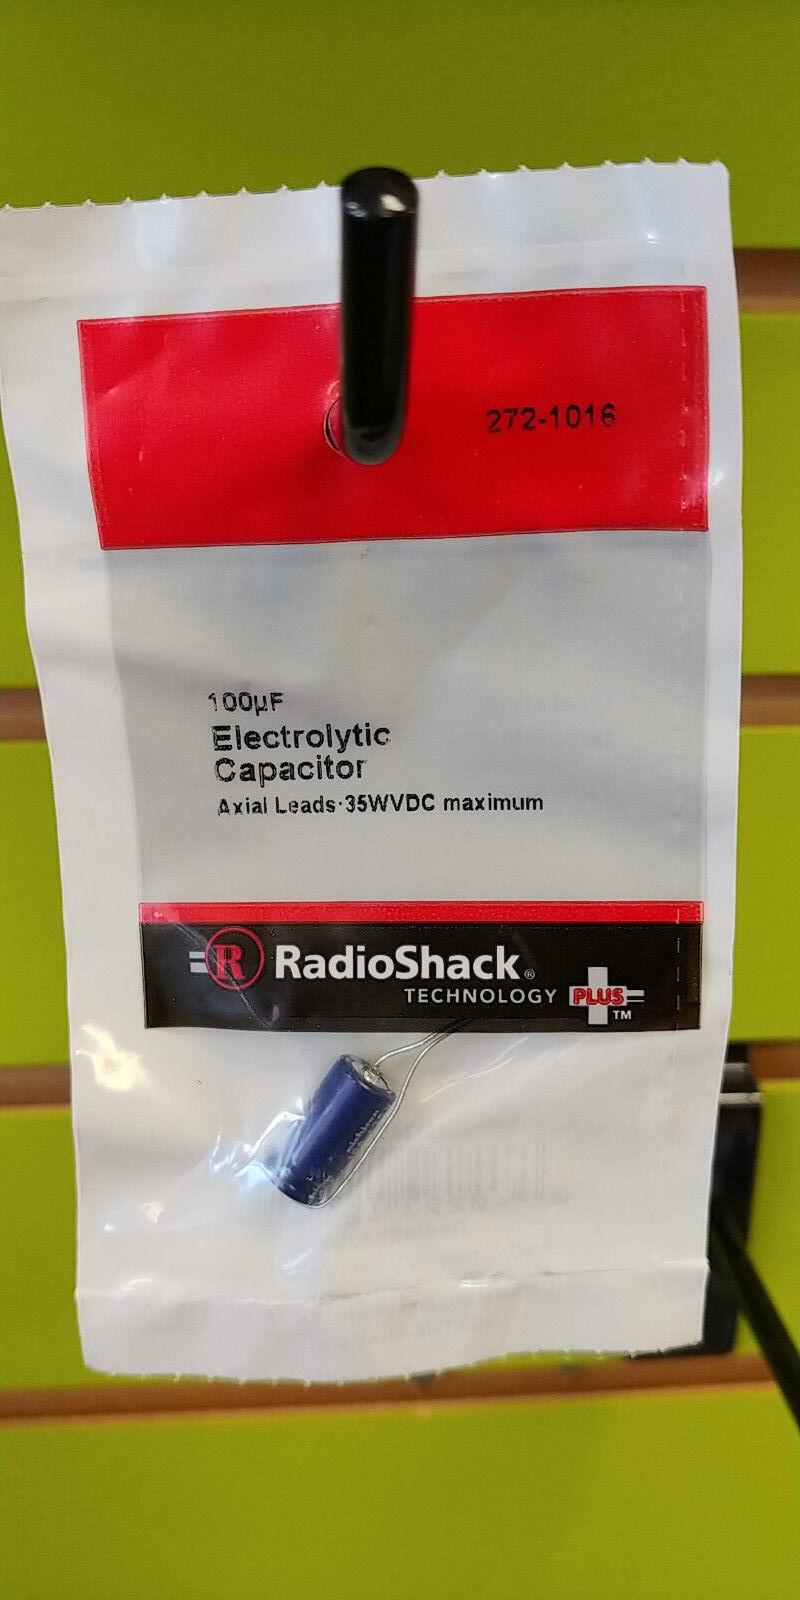 1000uf 16v Capacitor Radio Shack Wwwmiifotoscom